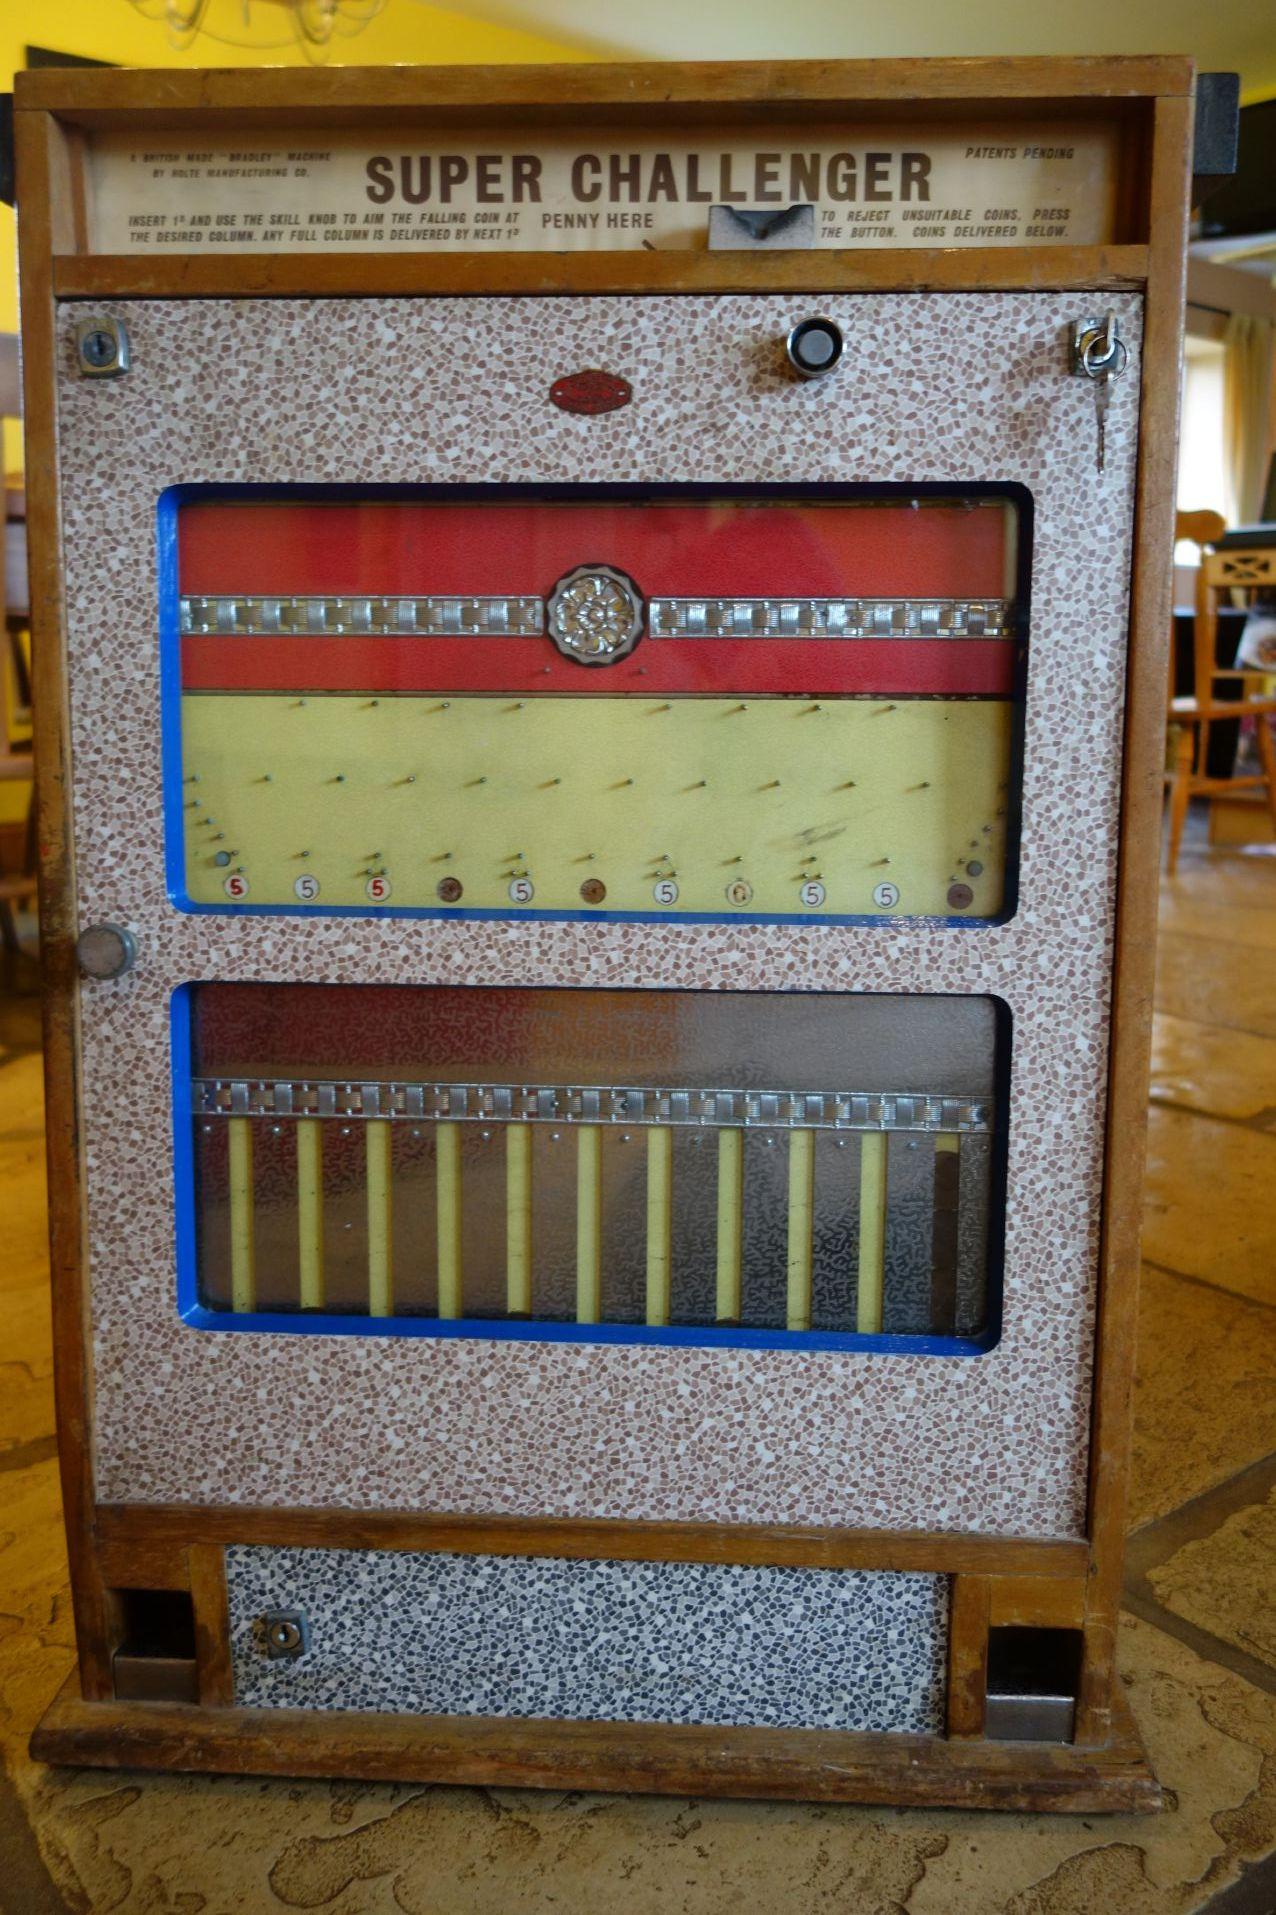 Challenger slot machine